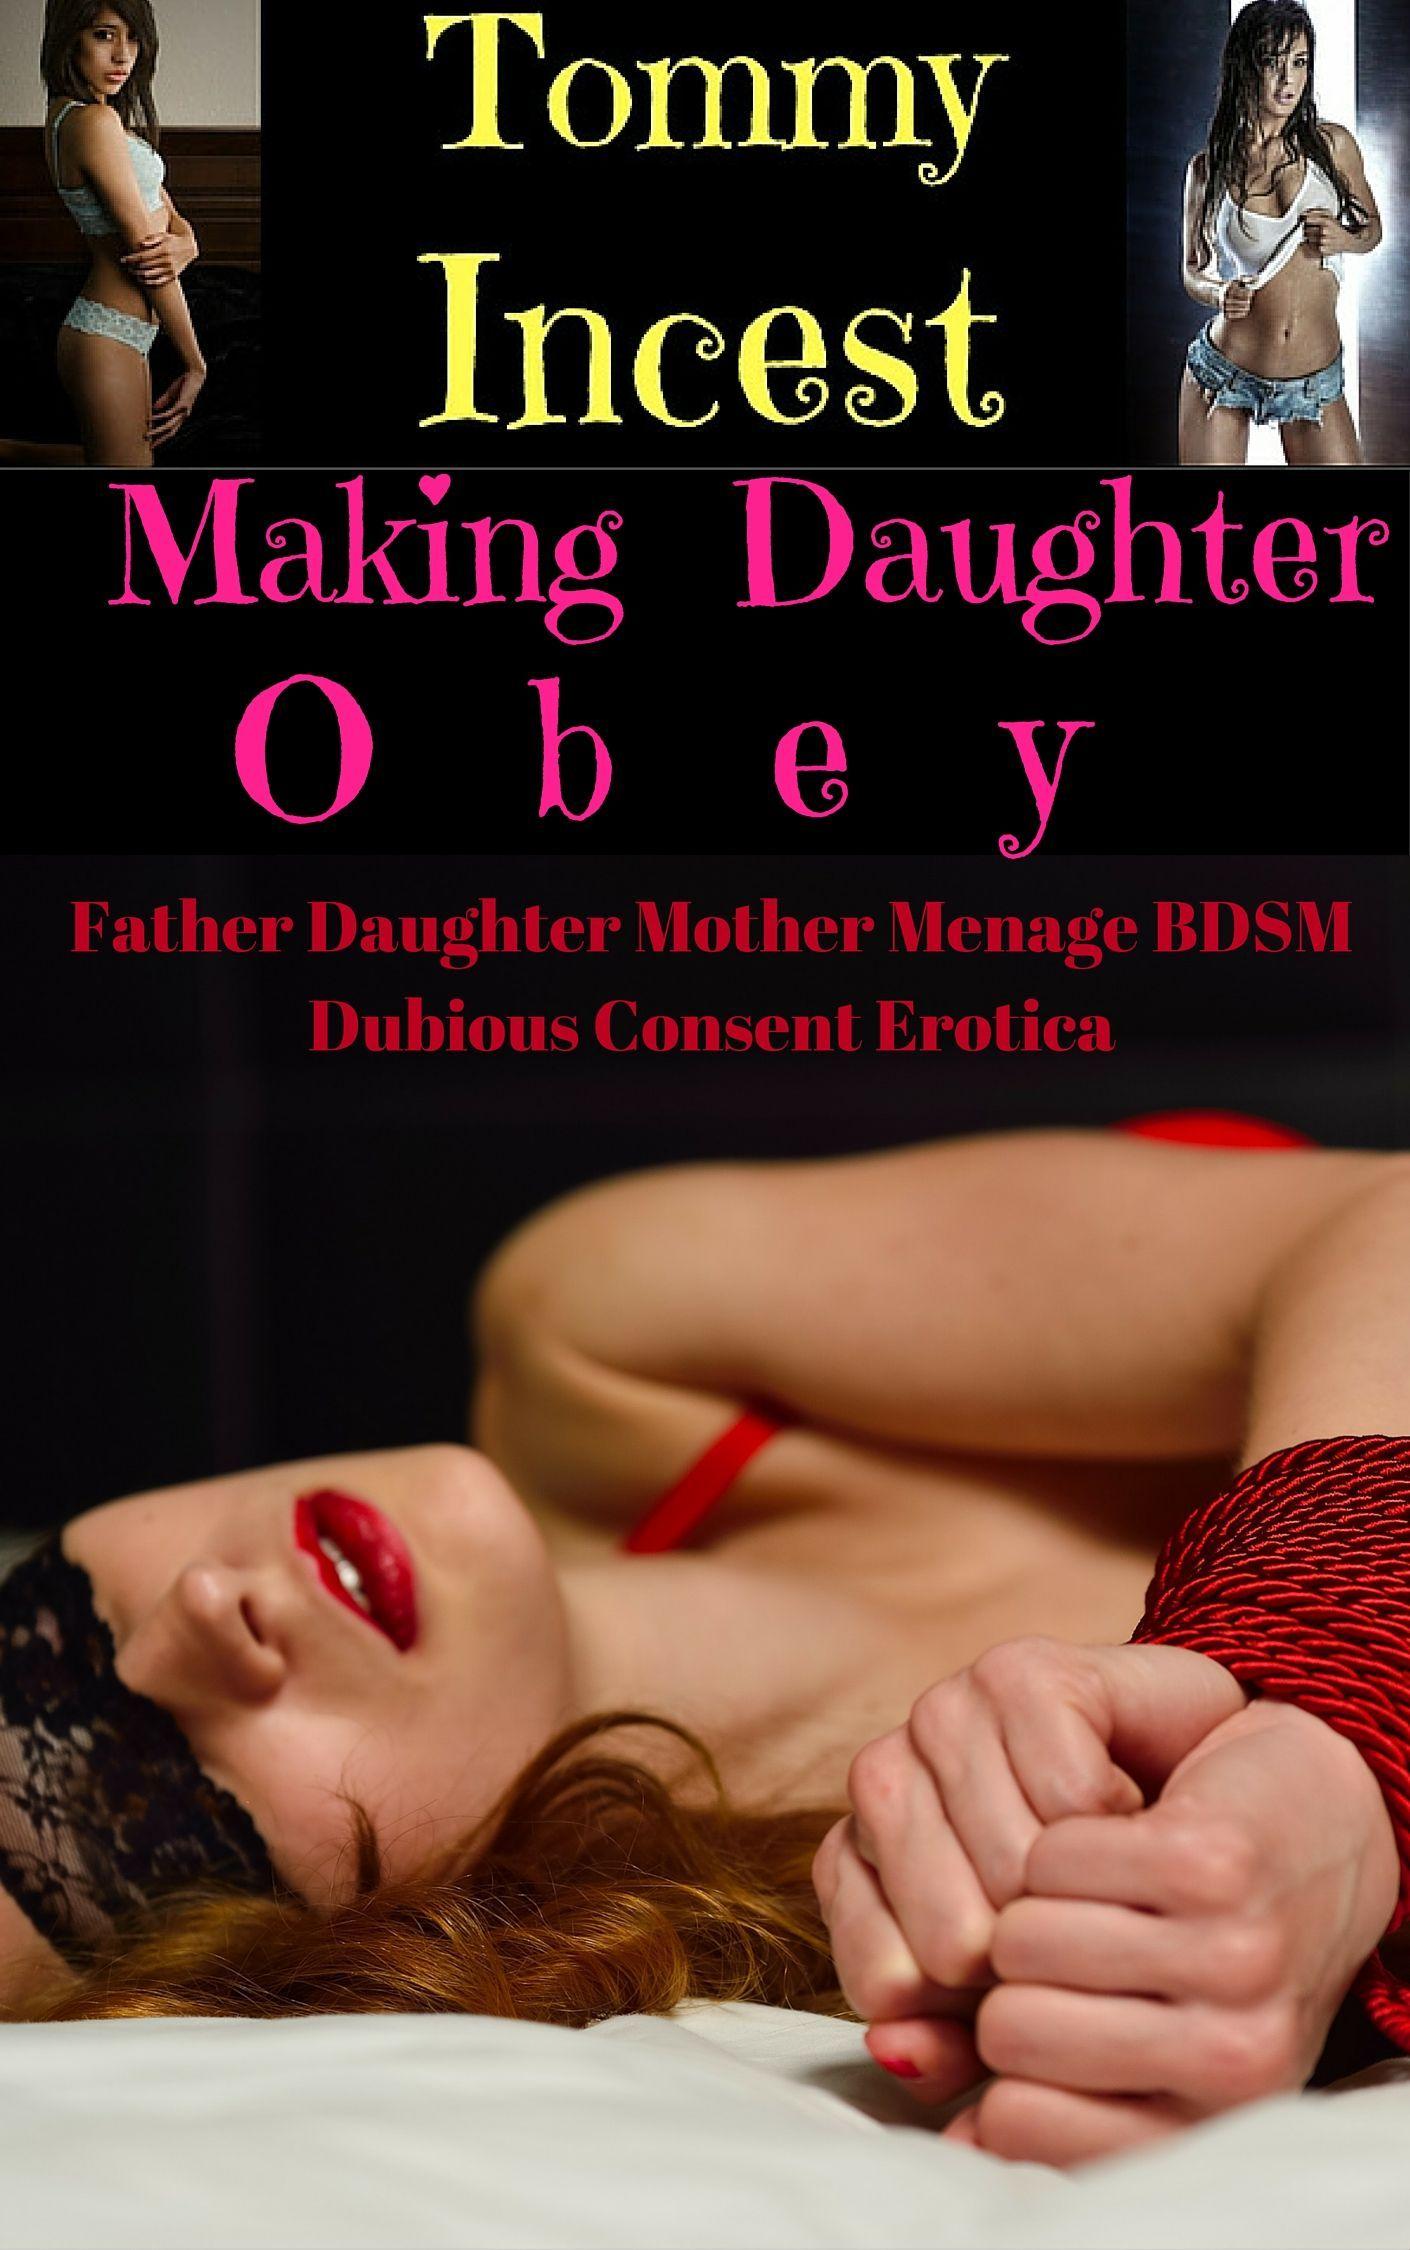 Erotica father daughter